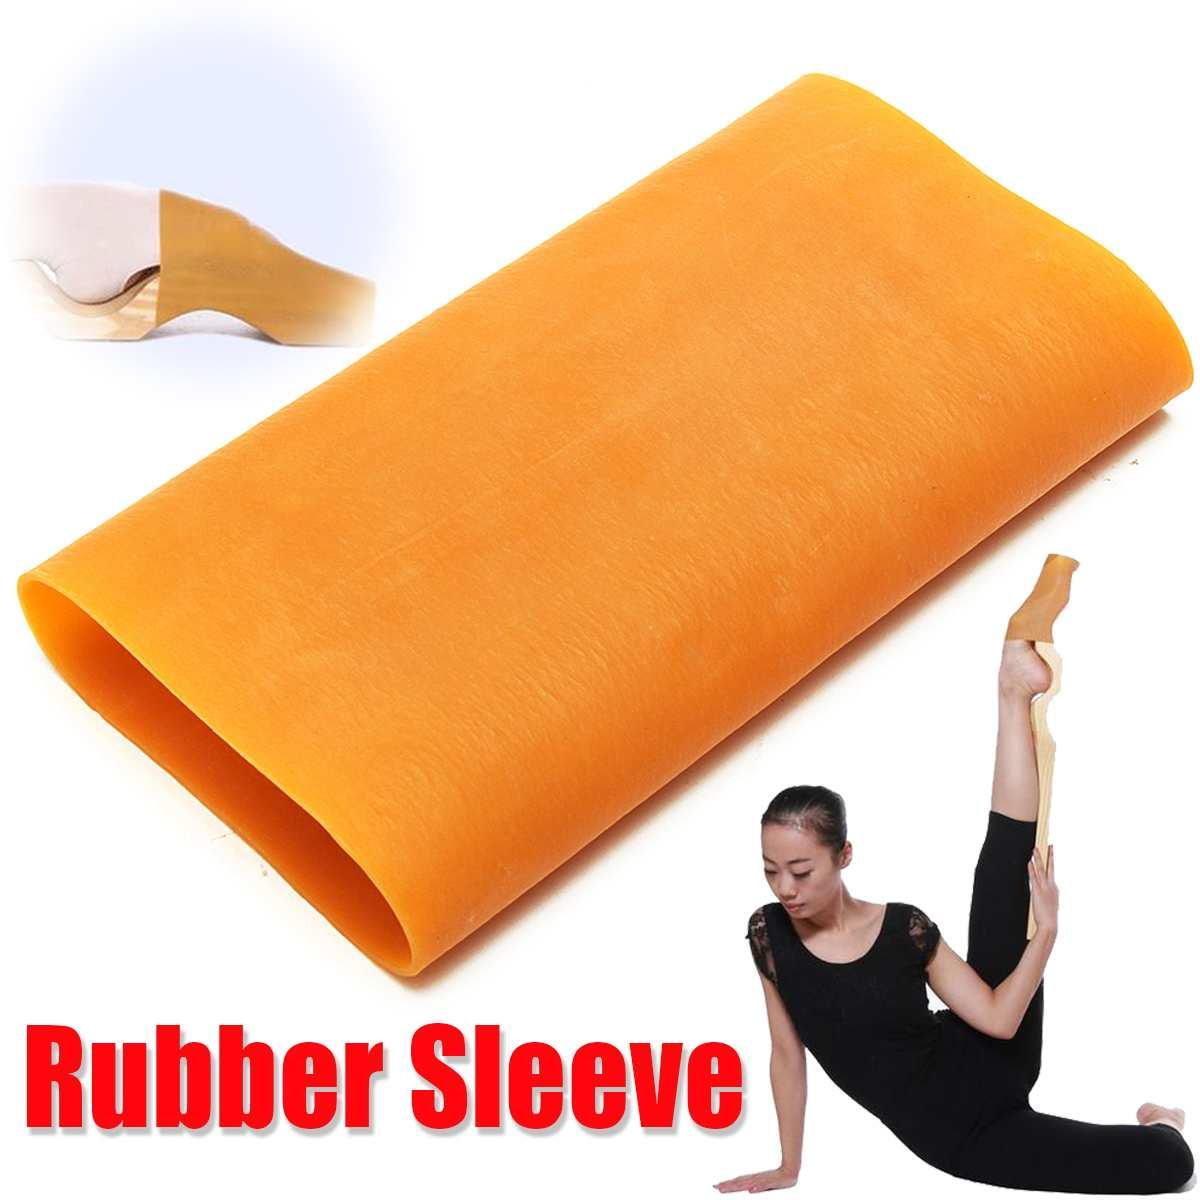 Ballet Dancer Cuff Dancing-Gymnastics Soft-Elastic Rubber-Sleeve for Ballet-Foot-Stretcher